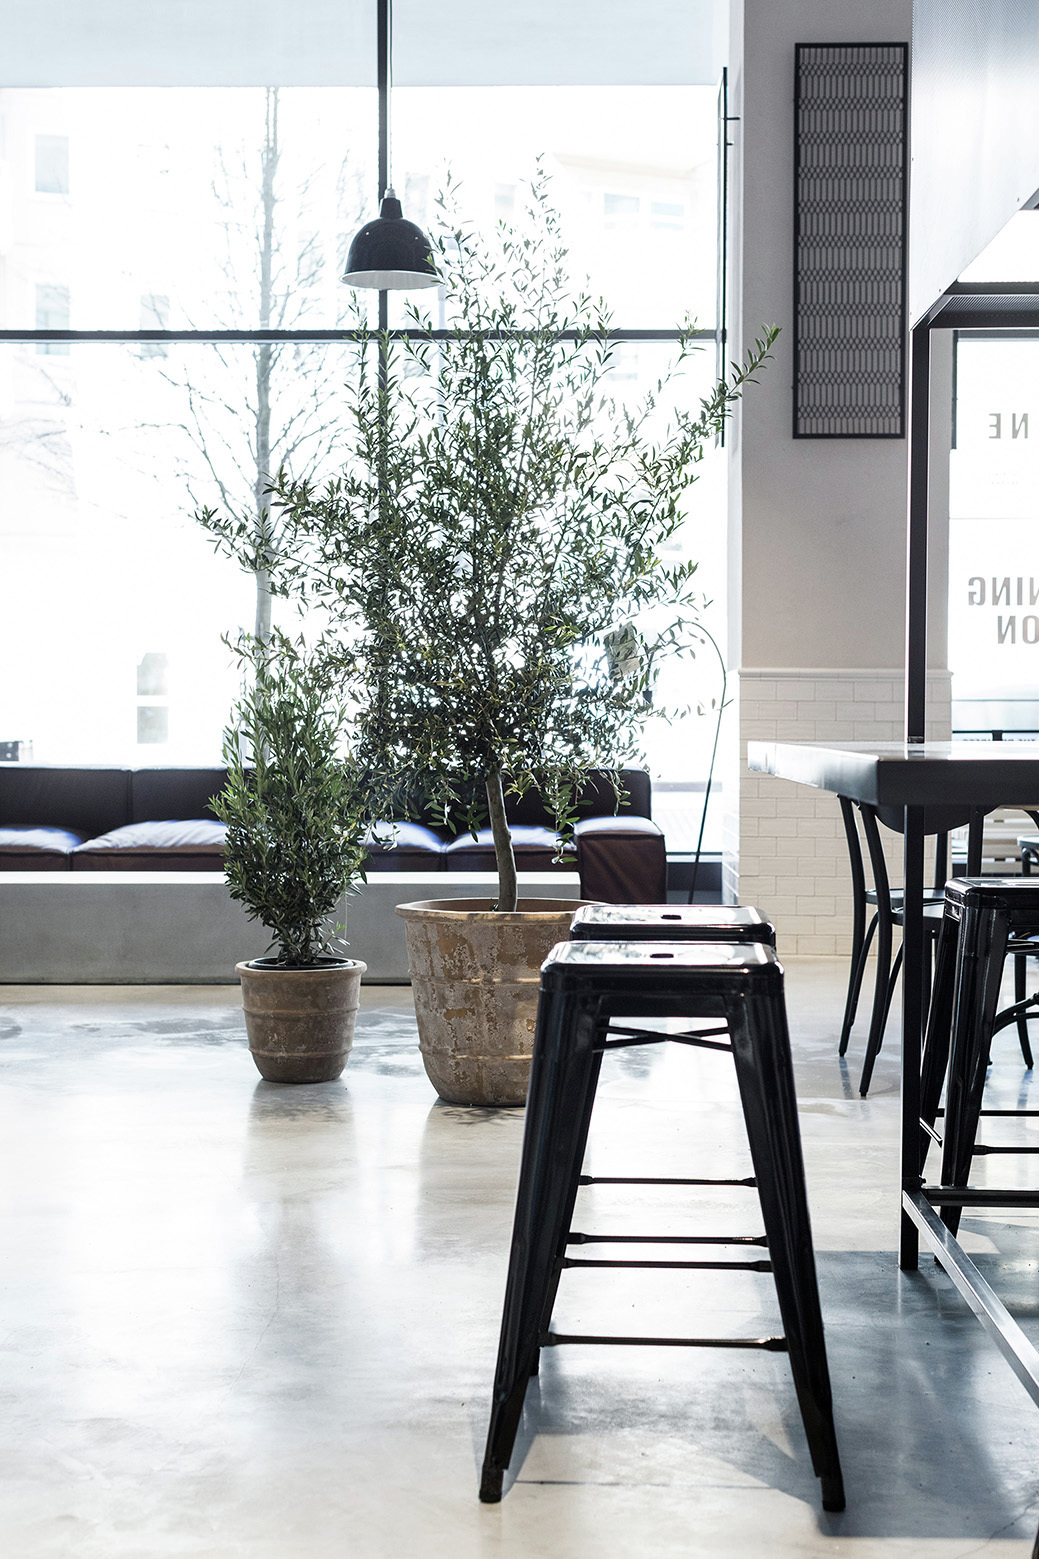 the usine restaurant in stockholm 6 The Usine Restaurant in Stockholm